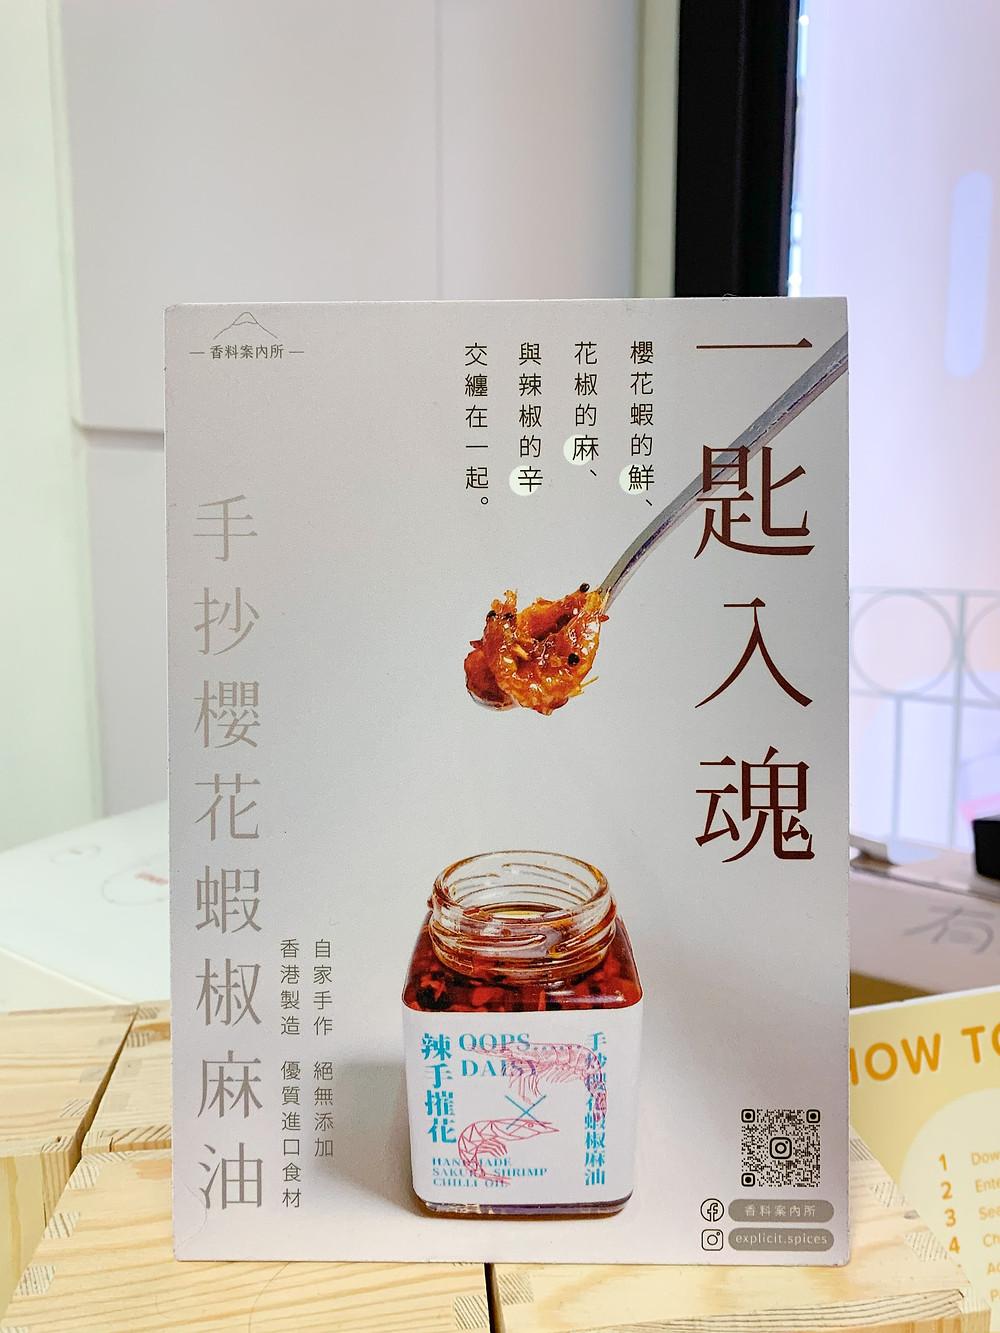 A jar of handmade sakura shrimp chili oil by @explicit.spices